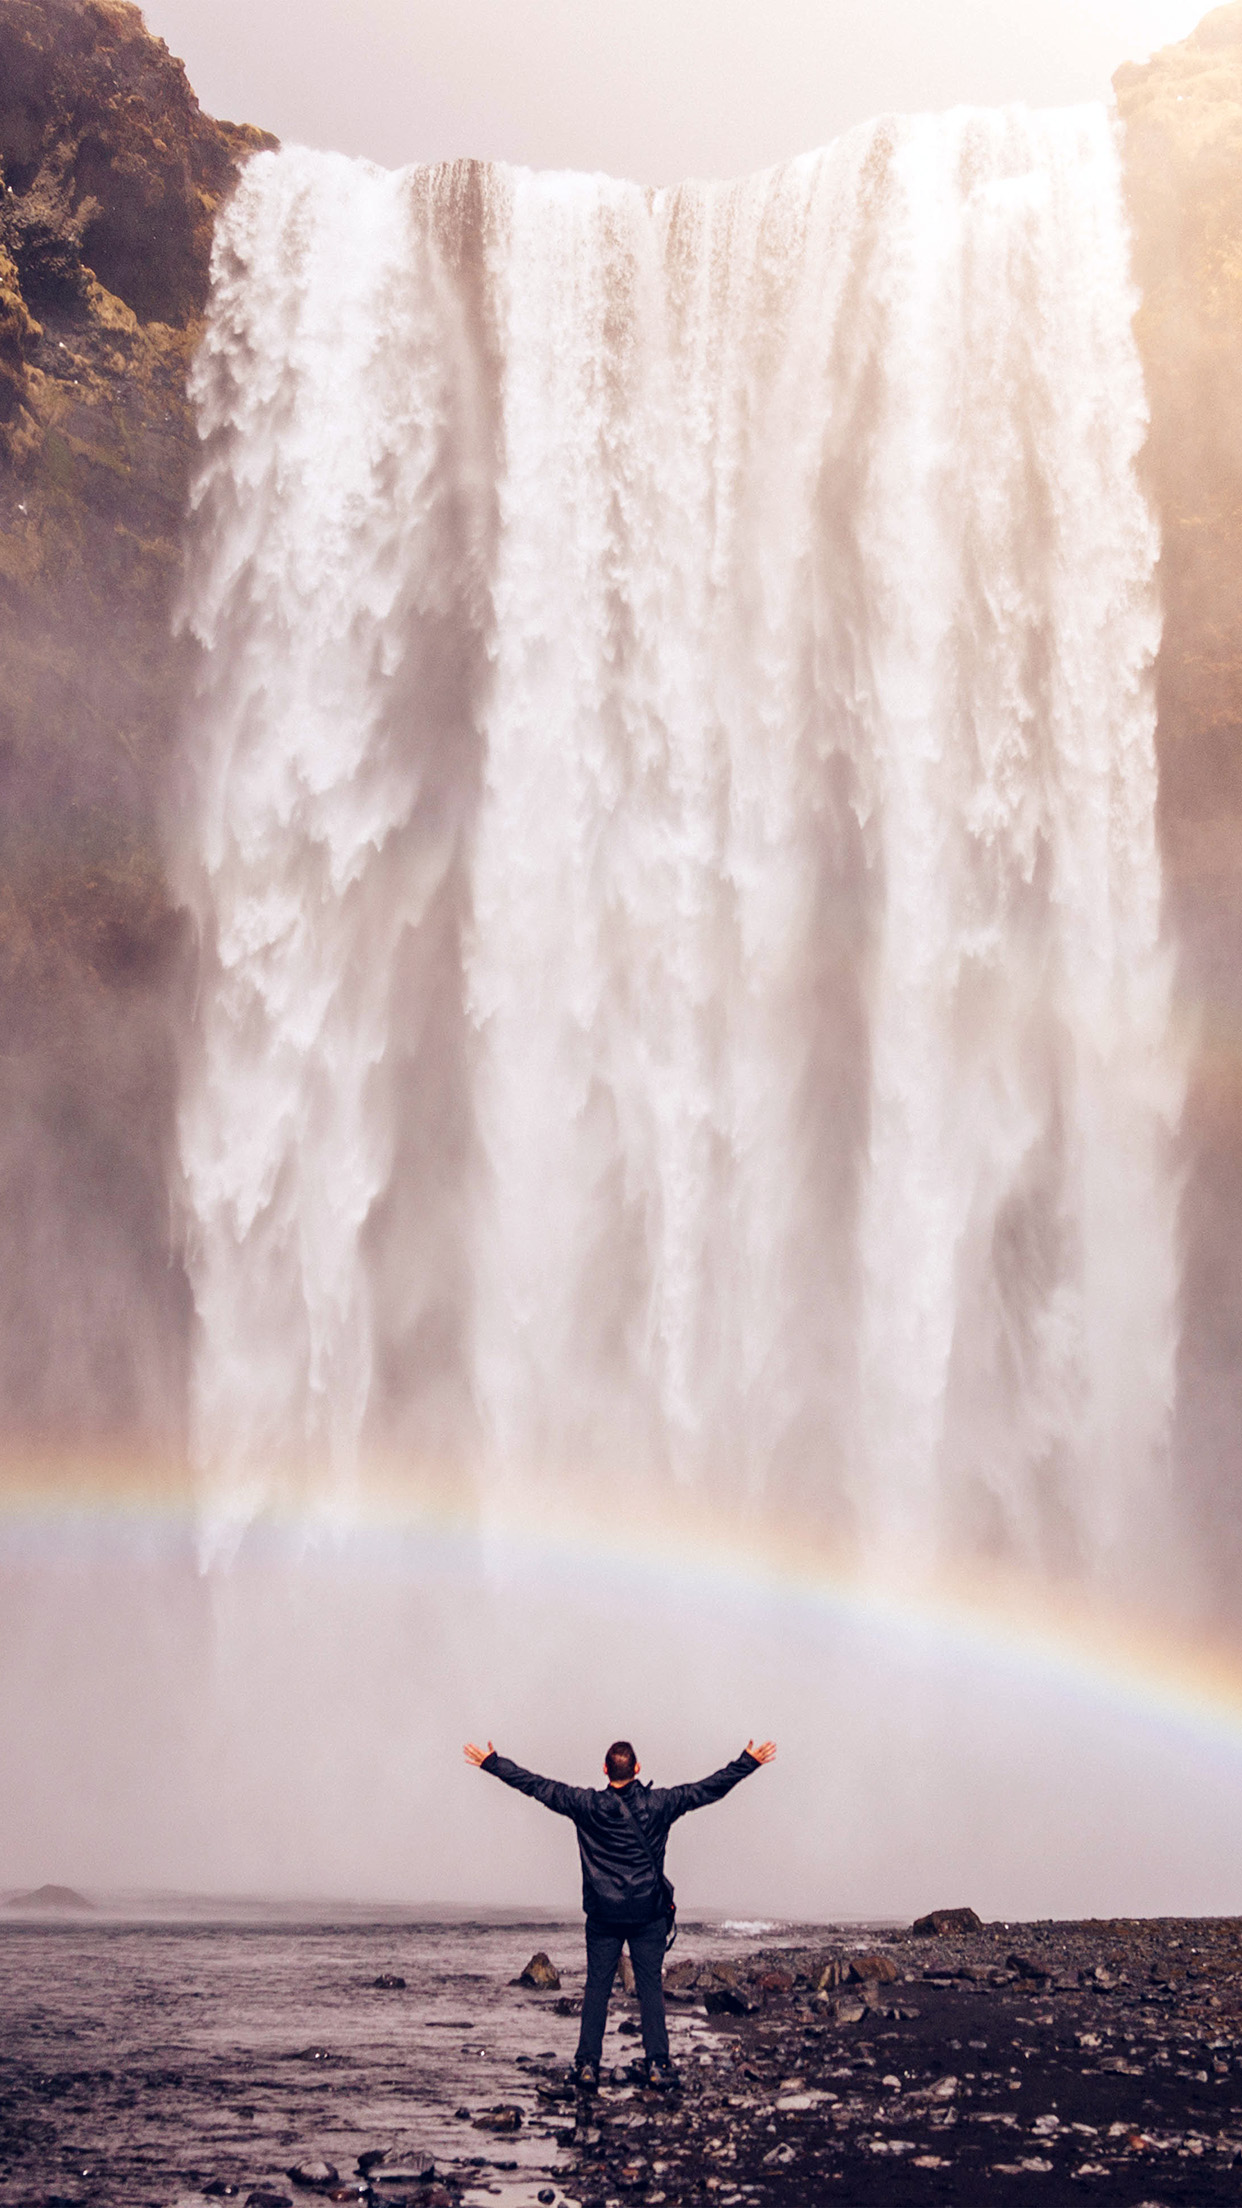 Waterfall Rainbow 3Wallpapers iPhone Parallax Waterfall: Rainbow